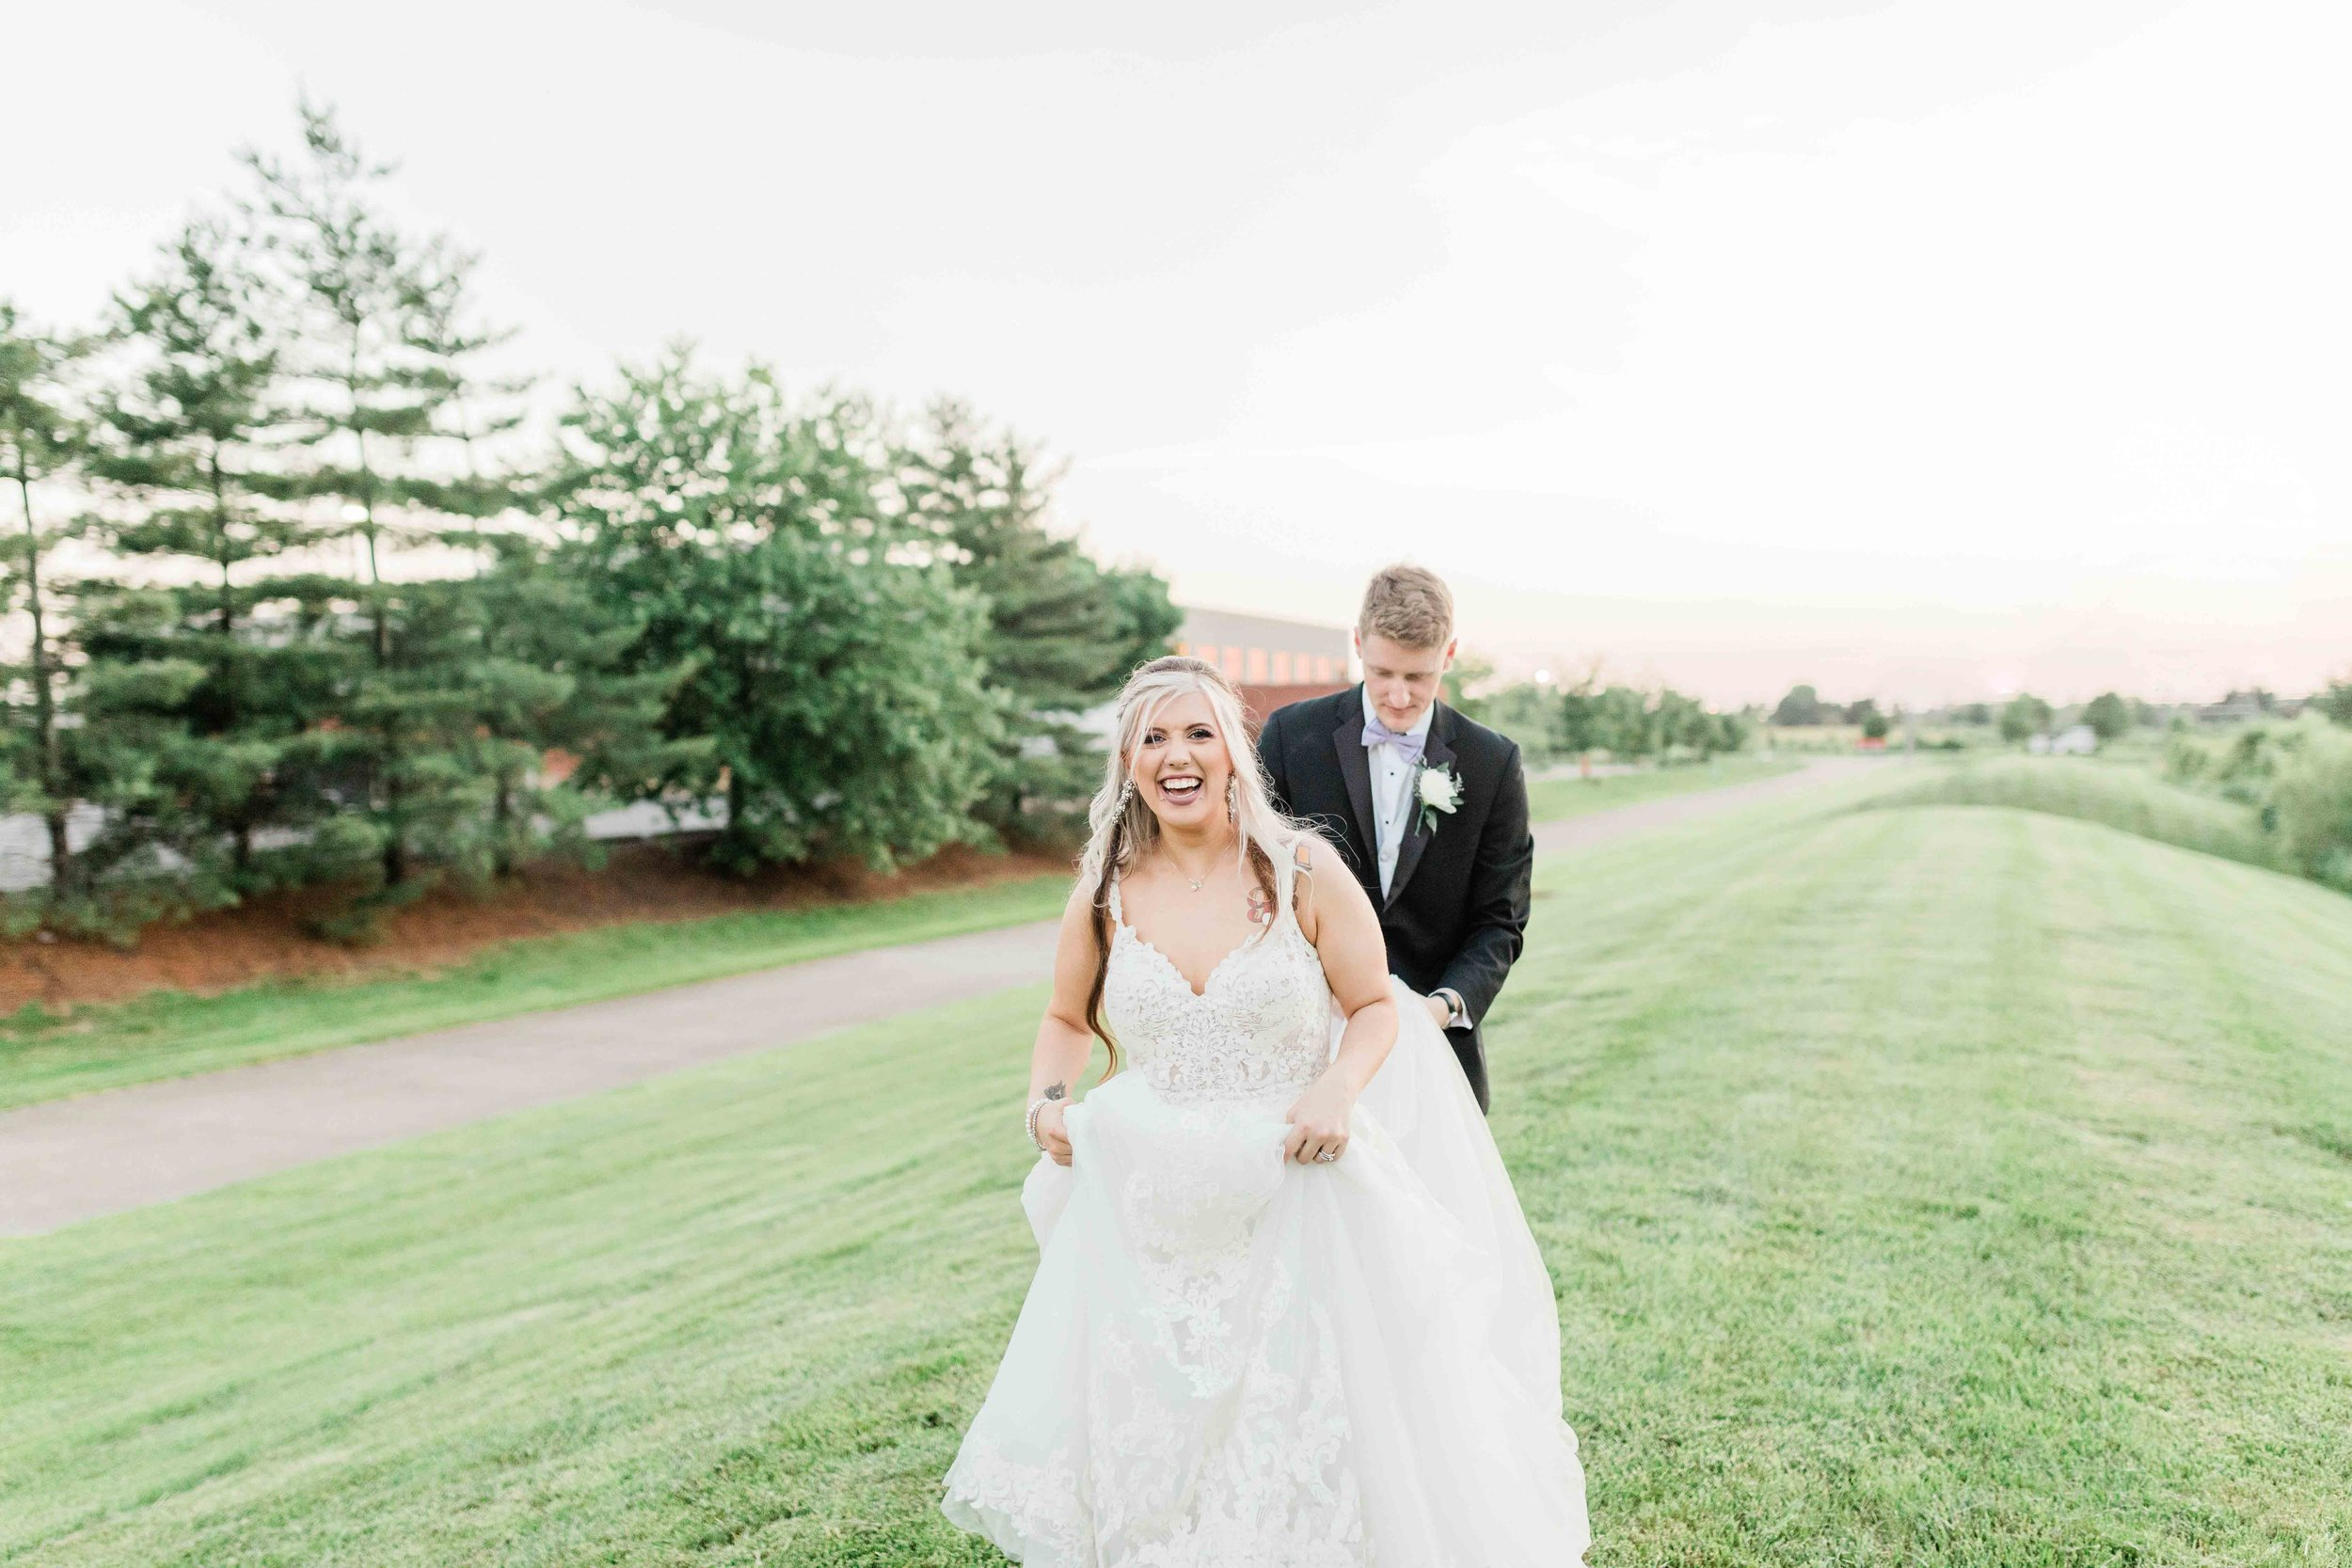 wedding photographers nky southwest ohio cincinnati dayton-11.jpg